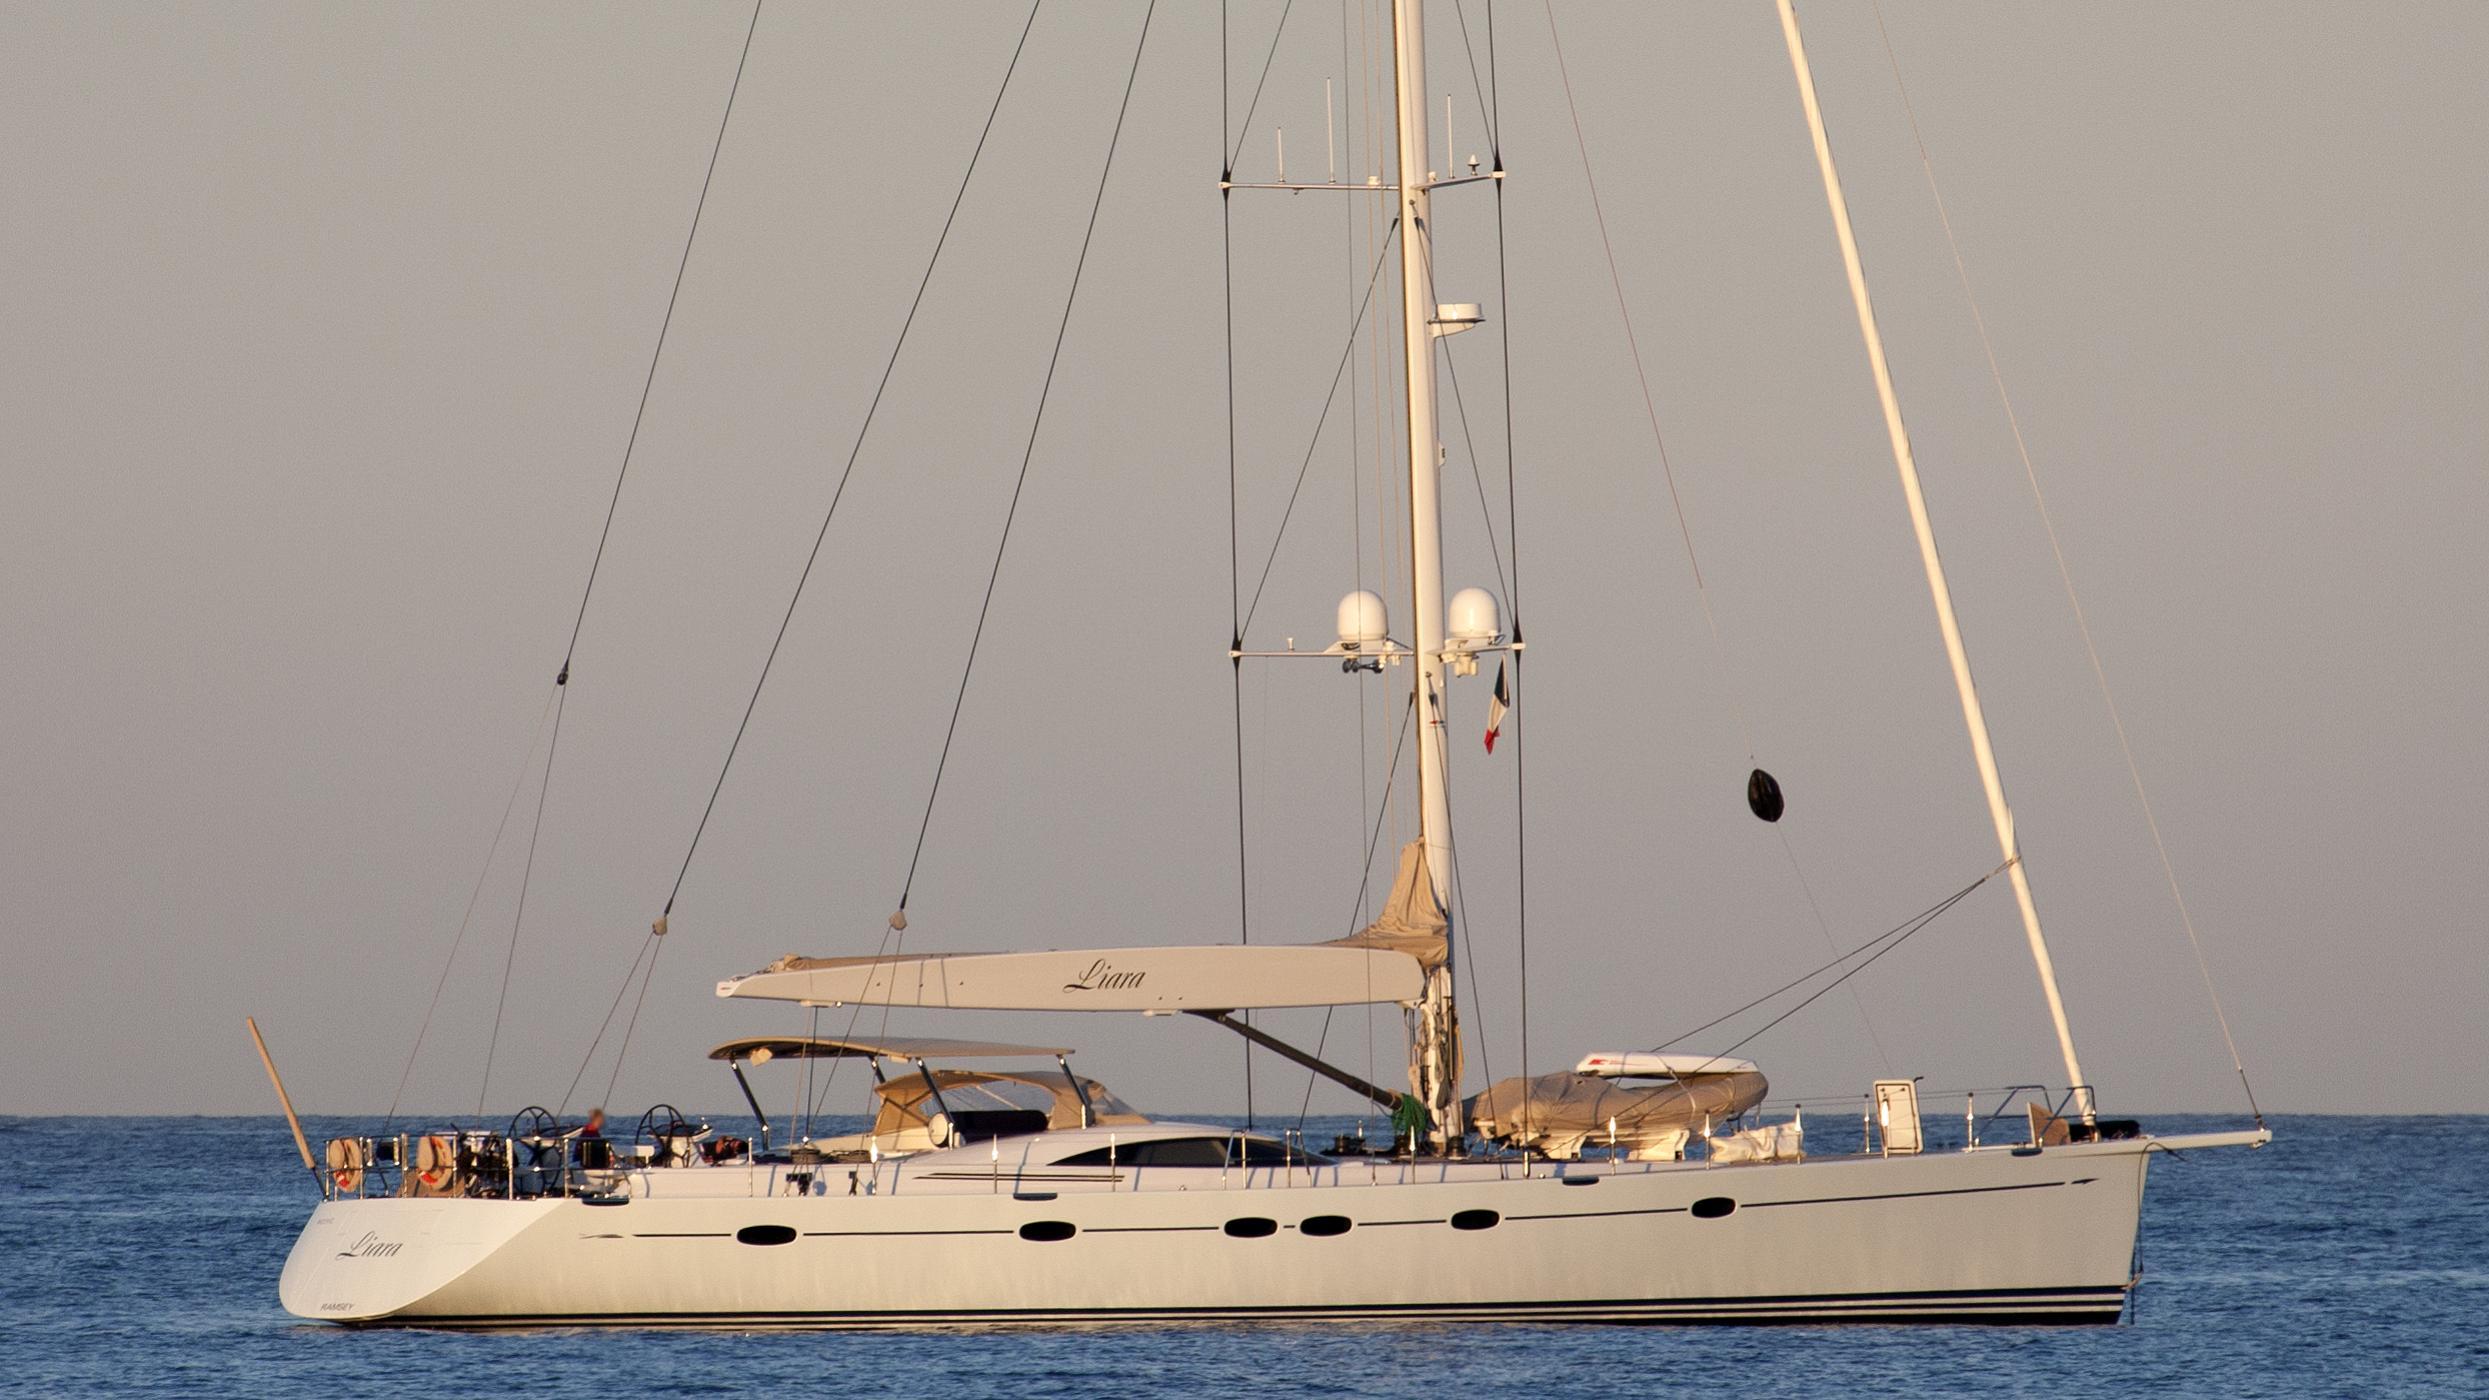 danneskjold liara-ii sailing yacht southern ocean marine 2009 32m profile